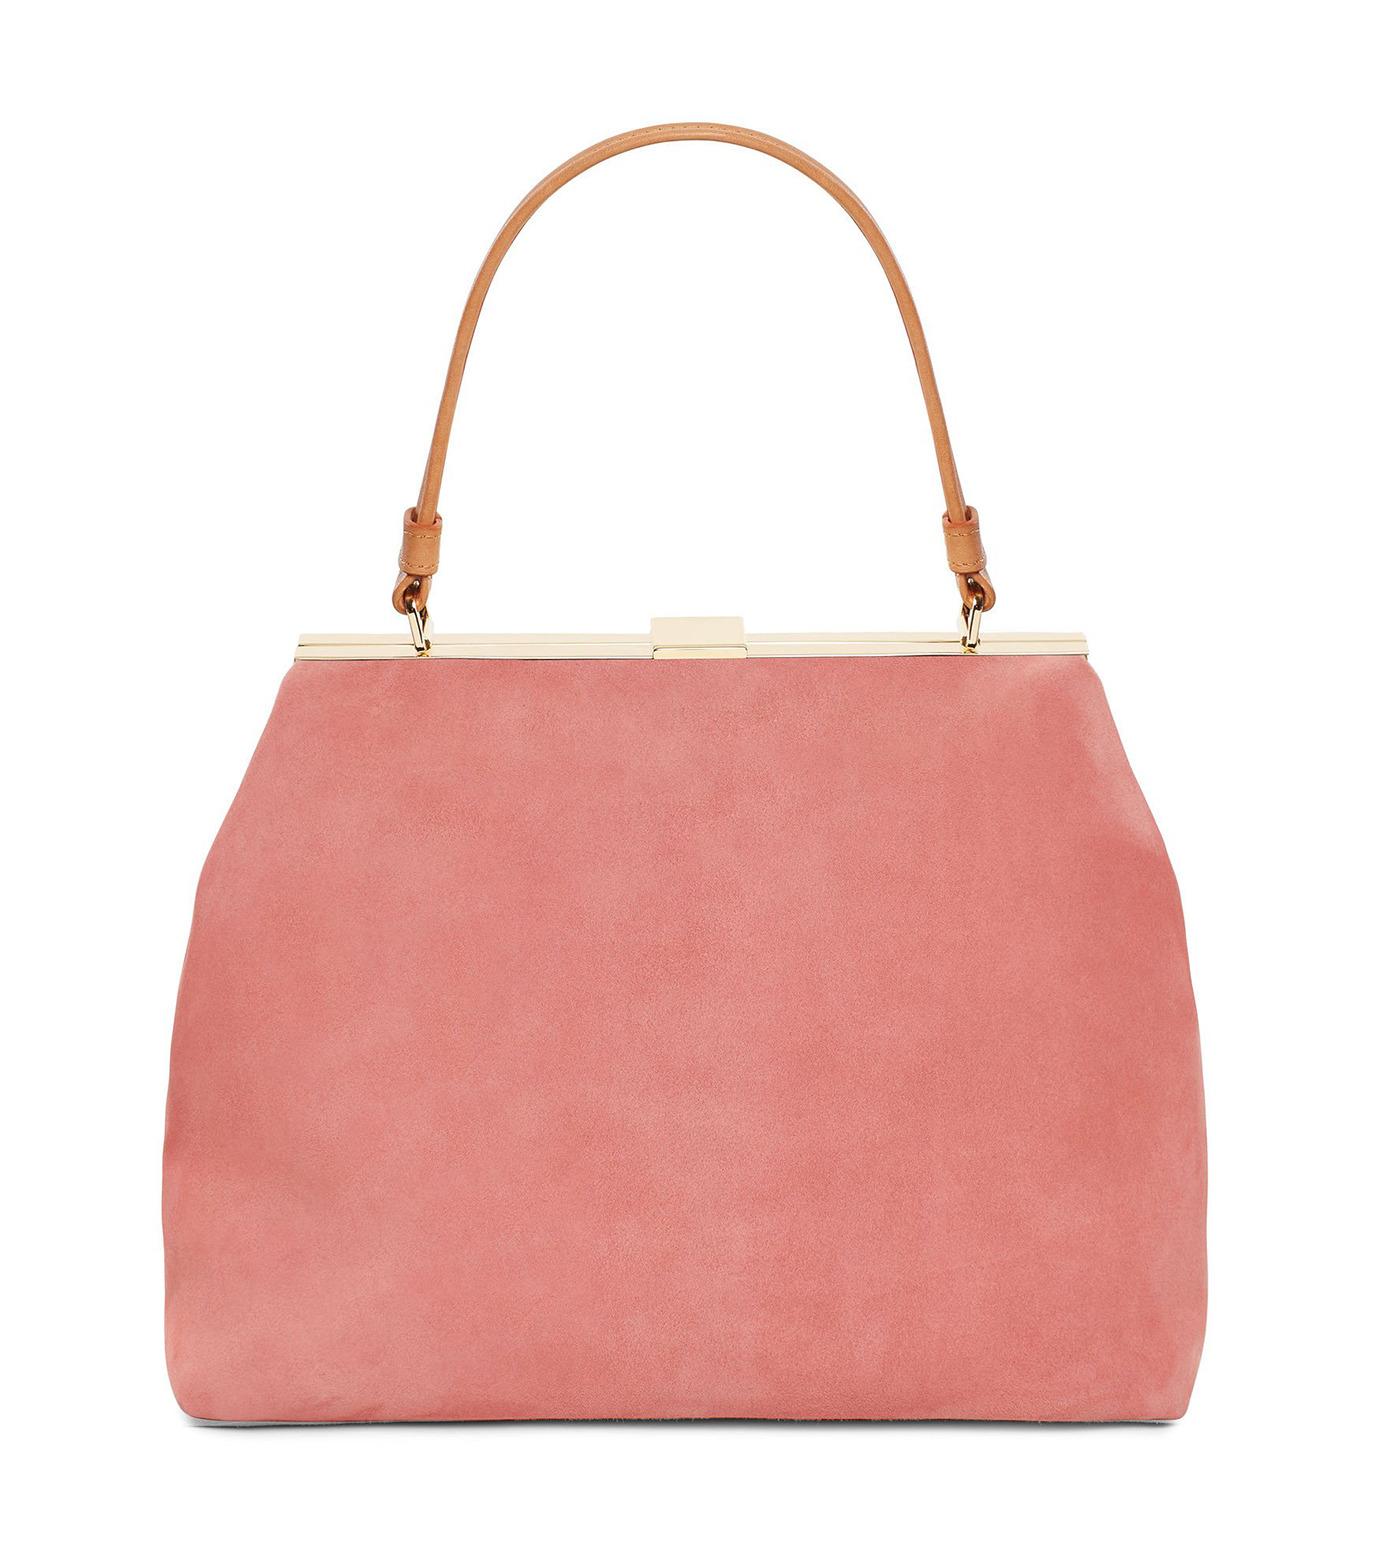 Mansur Gavriel(マンサーガブリエル)のsuede elegant bag-LIGHT PINK(ハンドバッグ/hand bag)-HEB024SU-71 拡大詳細画像1